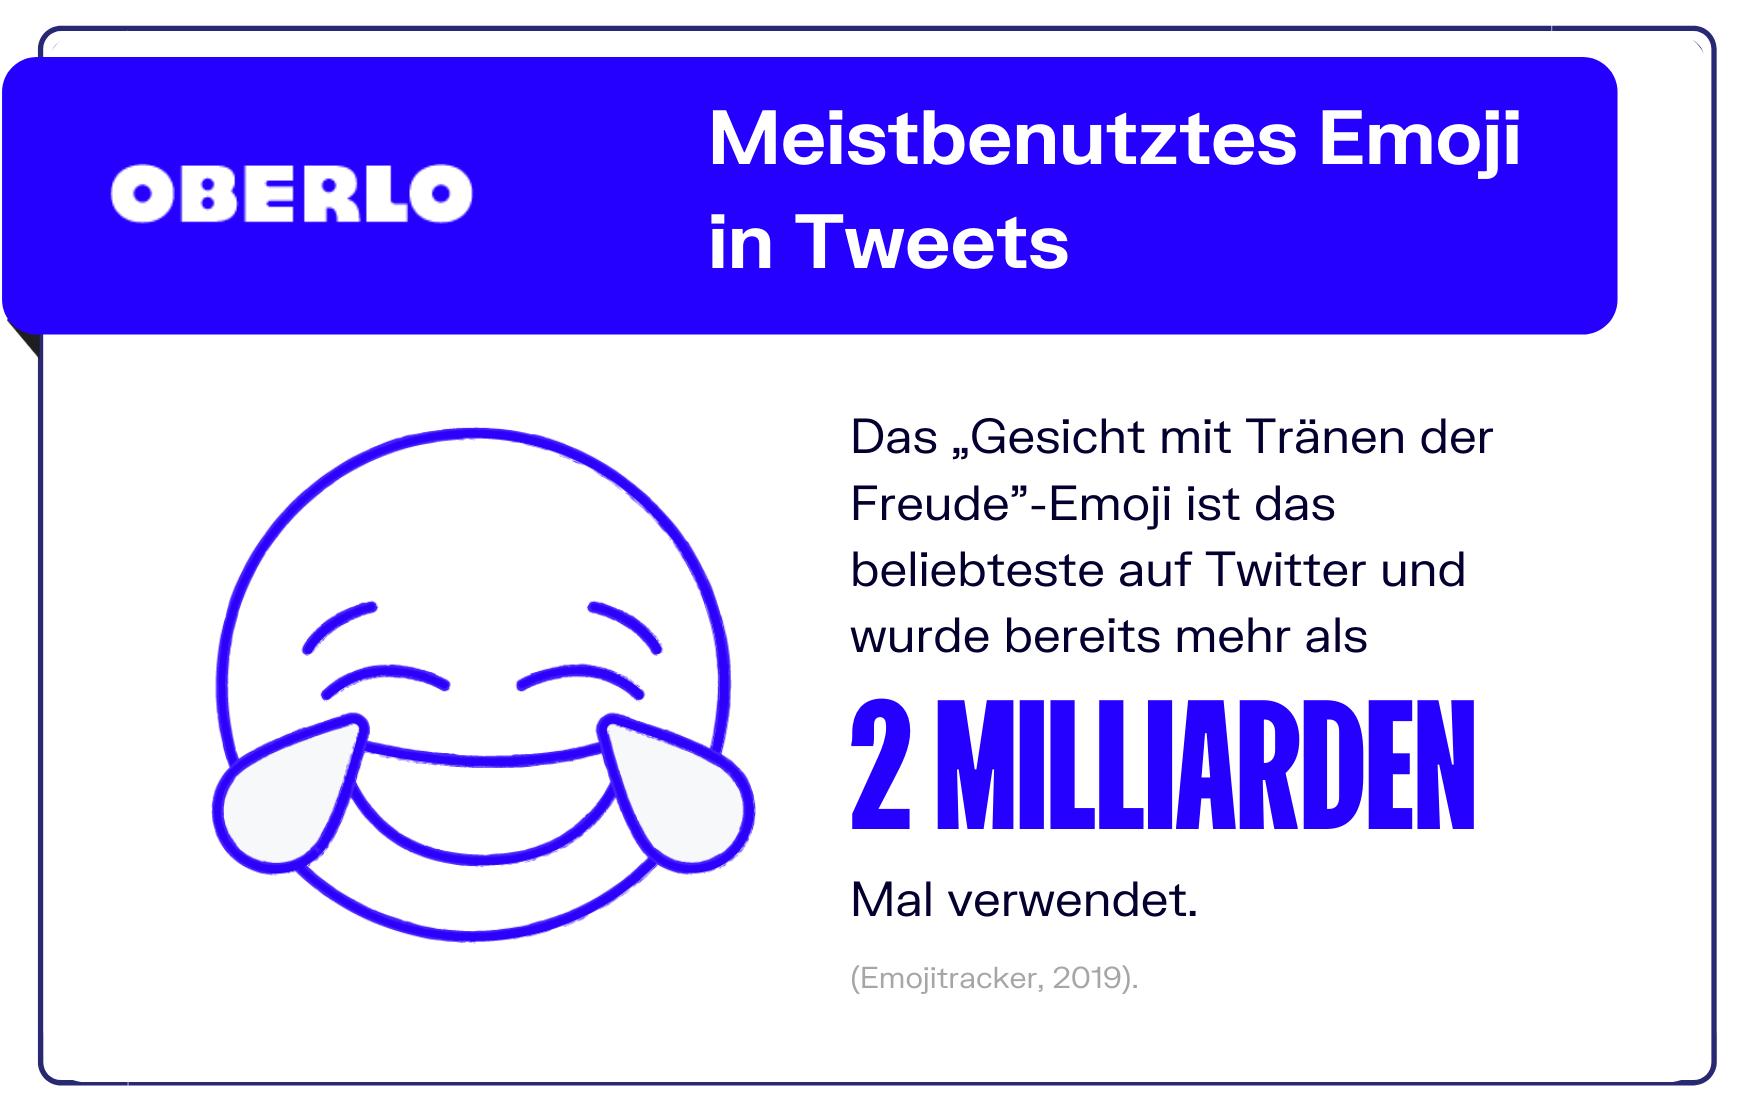 Twitter Statistiken - Emojis